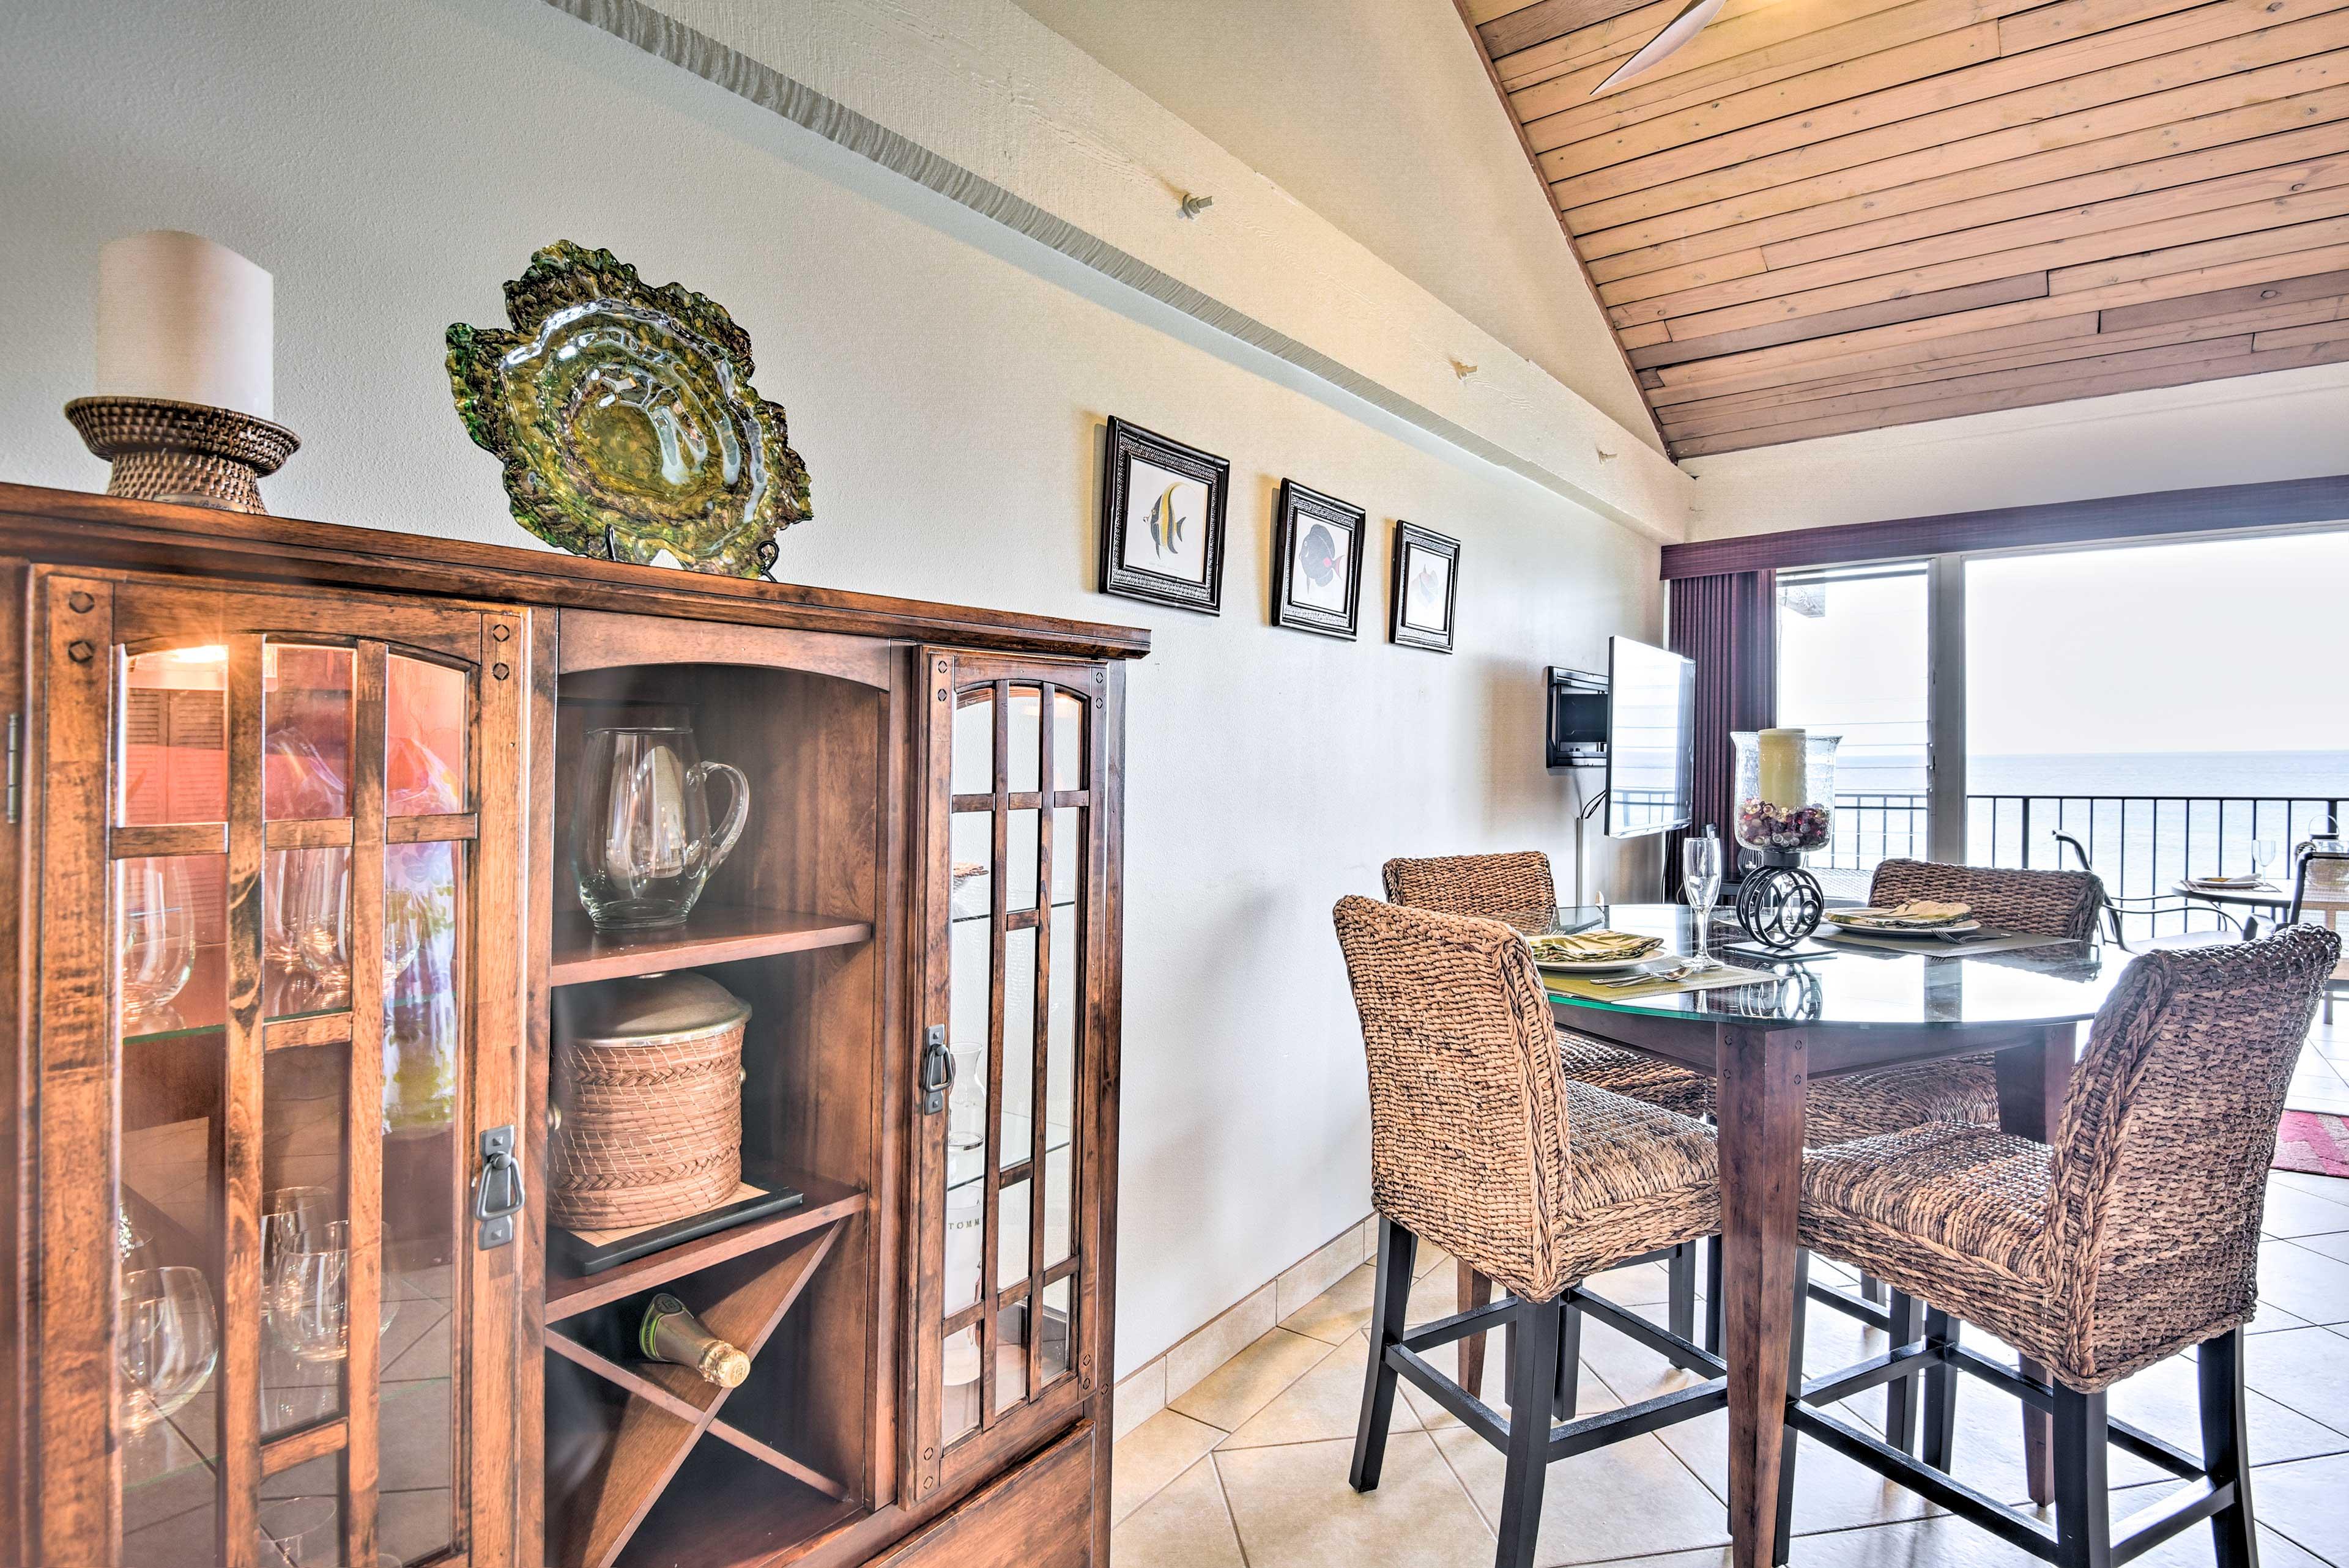 Elegant decor throughout the condo accentuates the resort-like feel.